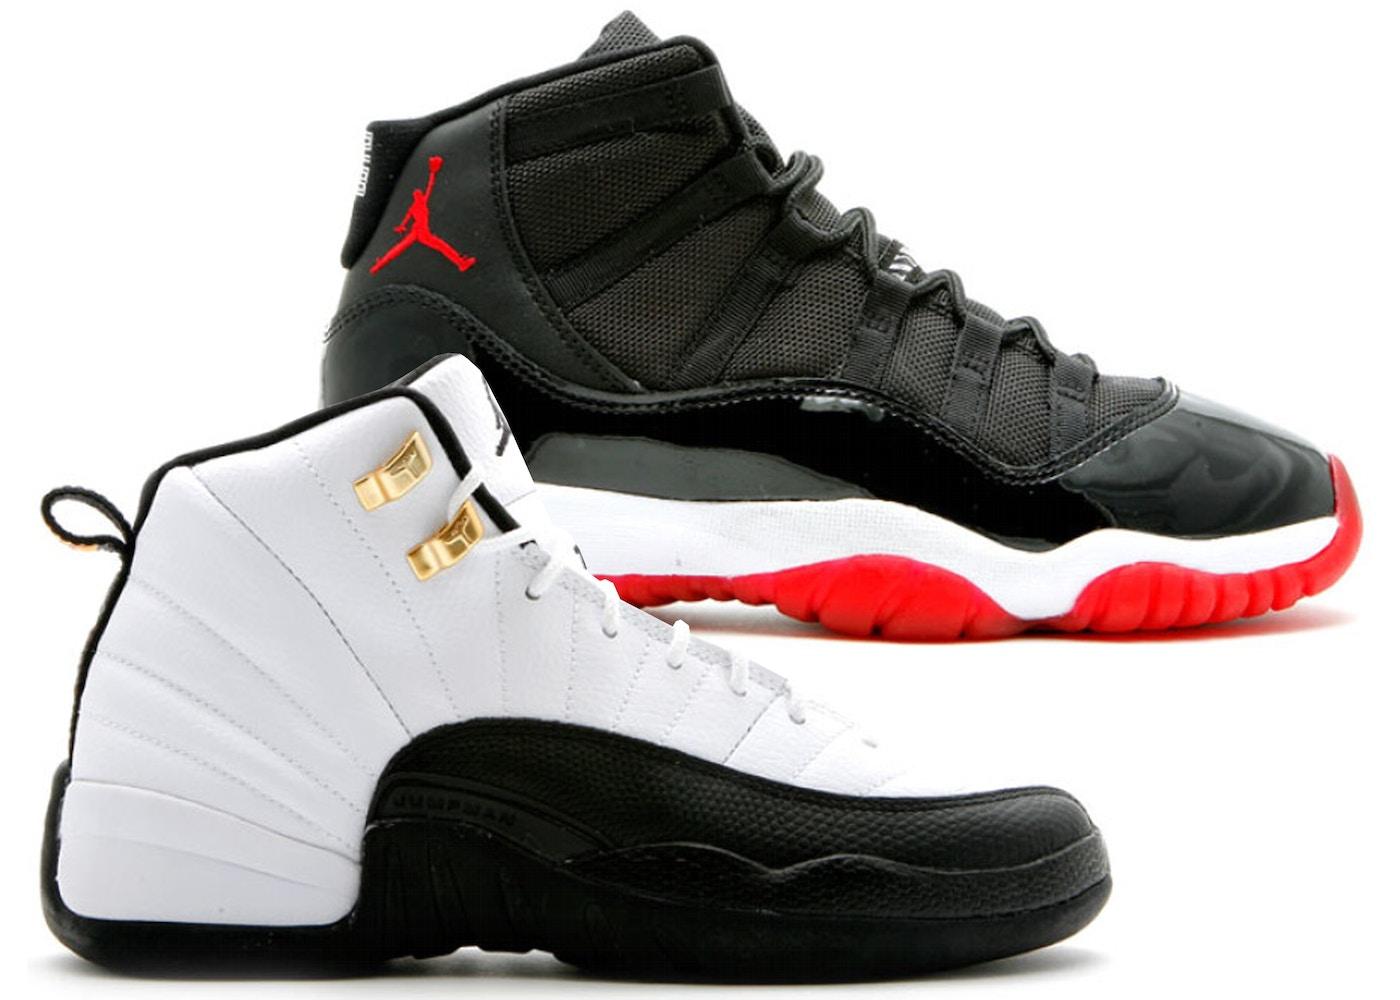 buy online 35b1e c3d90 Jordan Countown Pack 11 12 (GS) - 338150-991